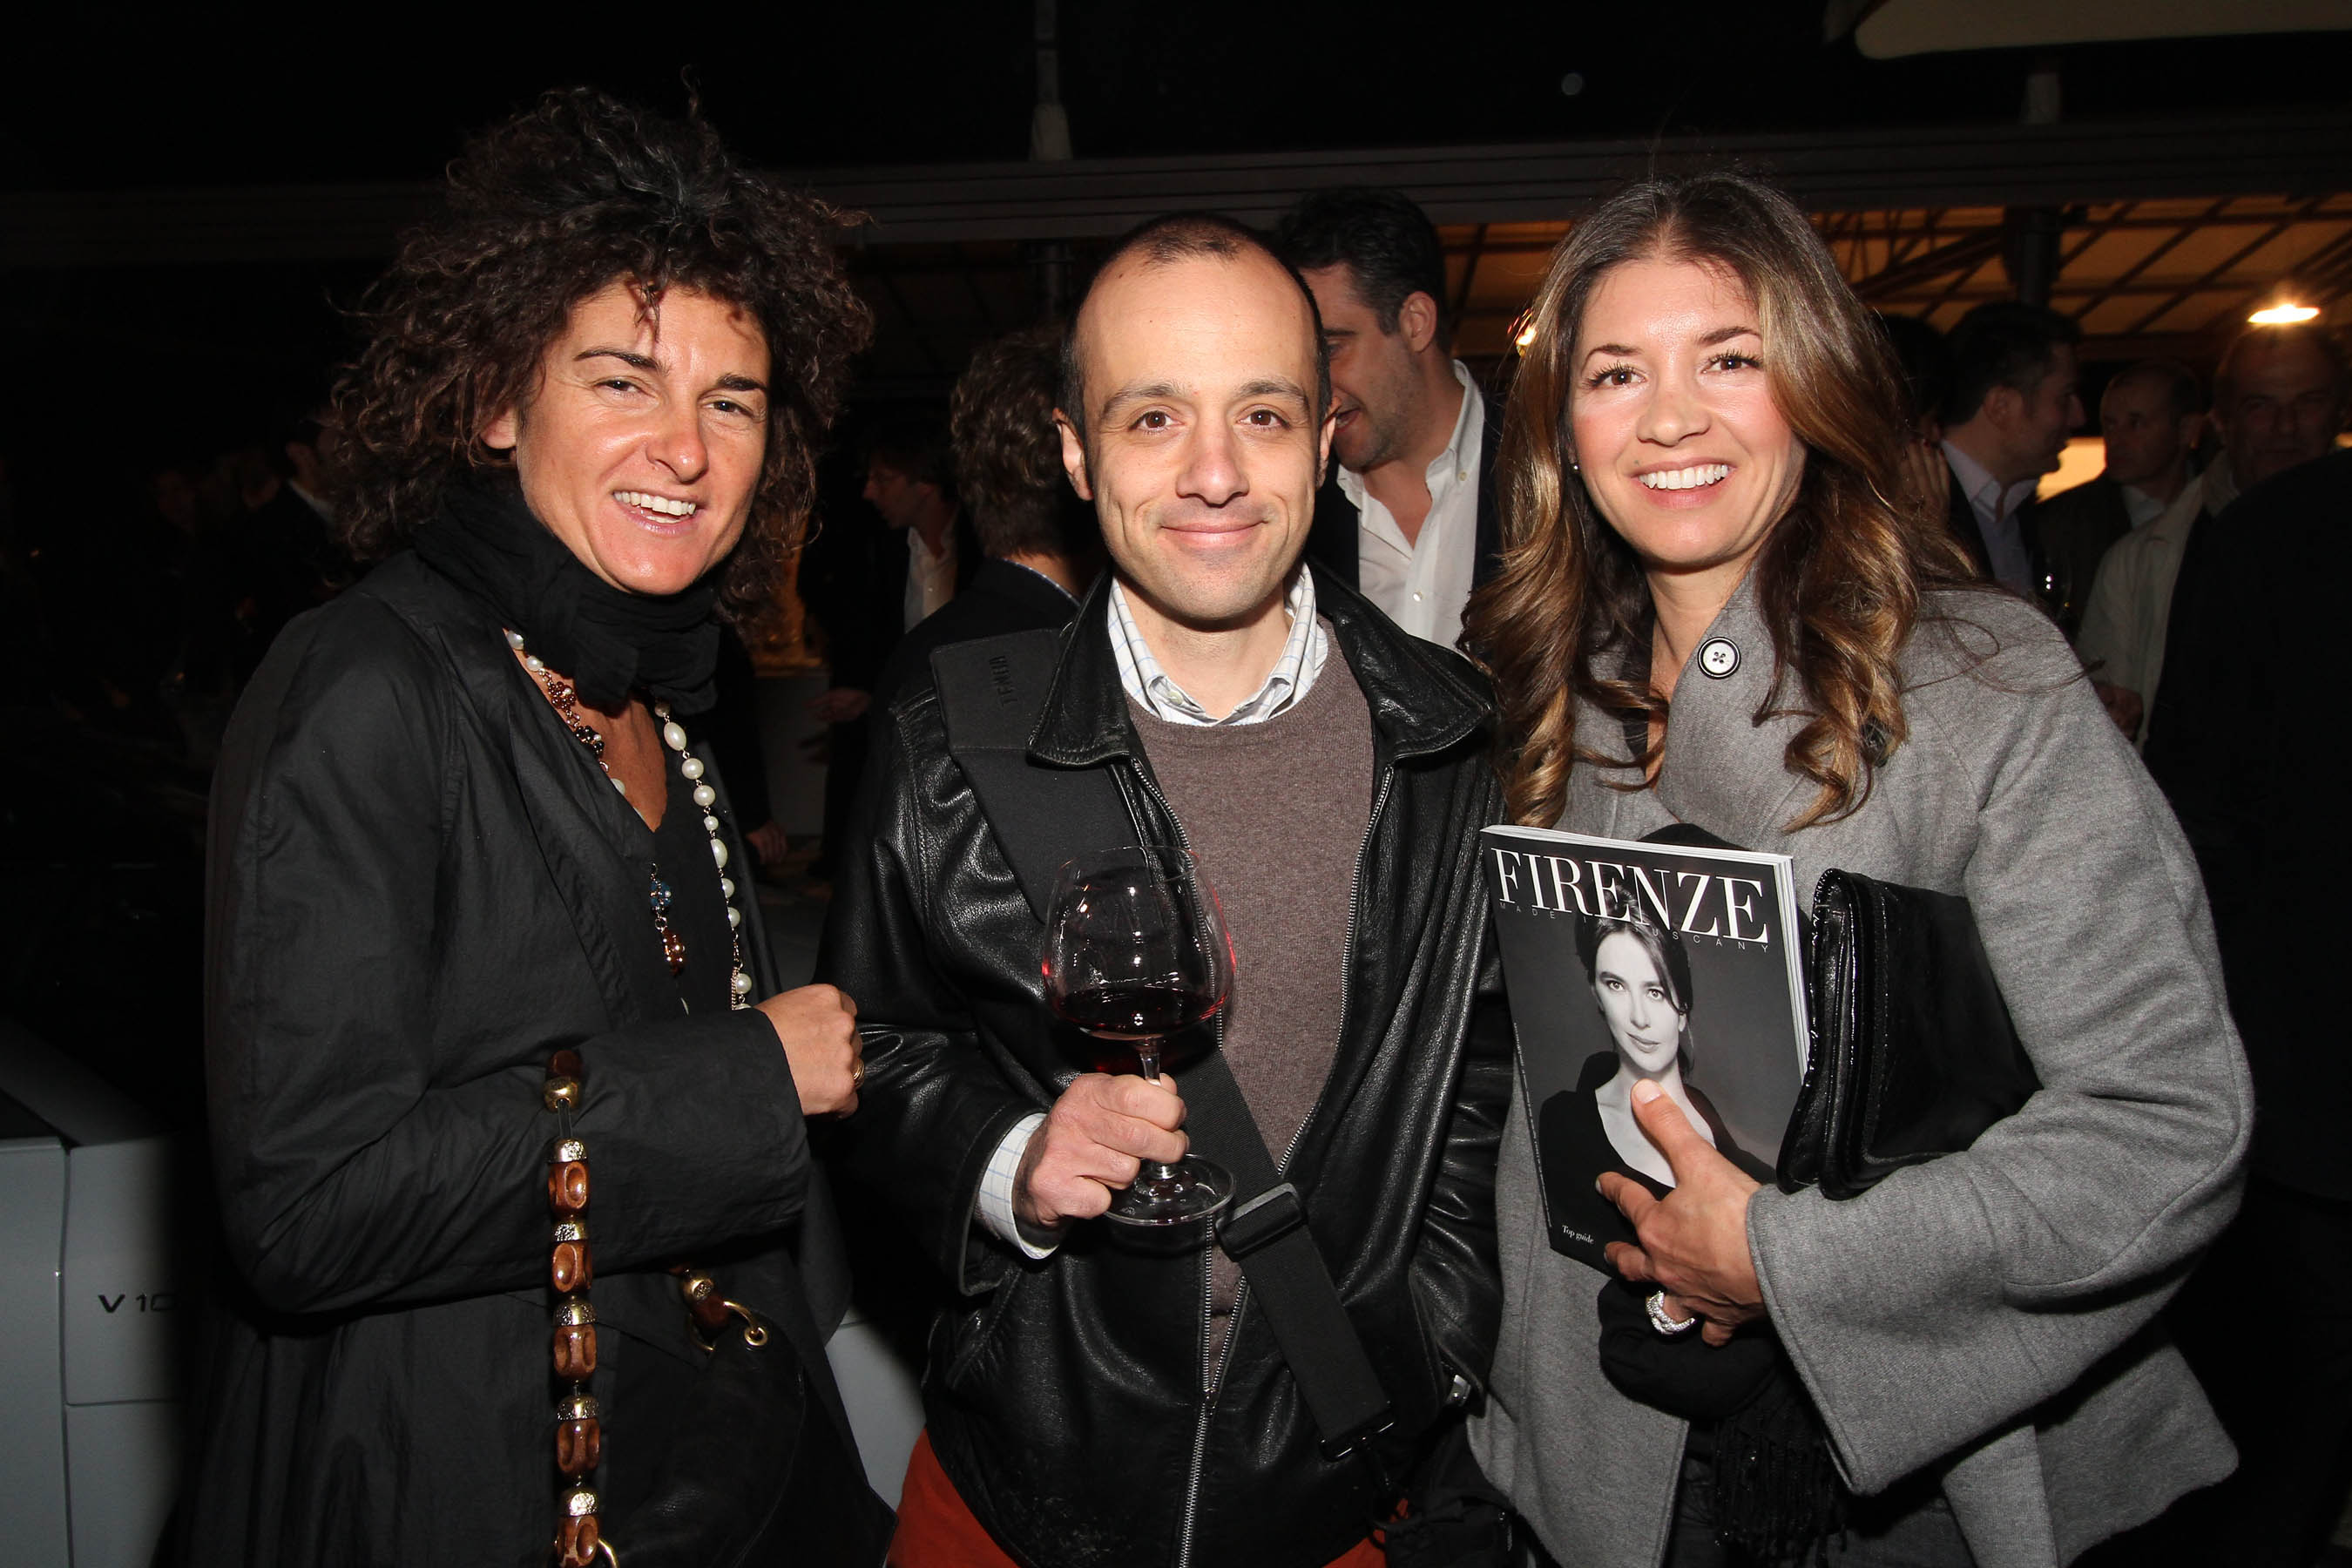 PRESSPHOTO Firenze, festa Firenze Magazine. Nella foto  Maura Bartolozzi e Simona Aronni con Matteo Brogi